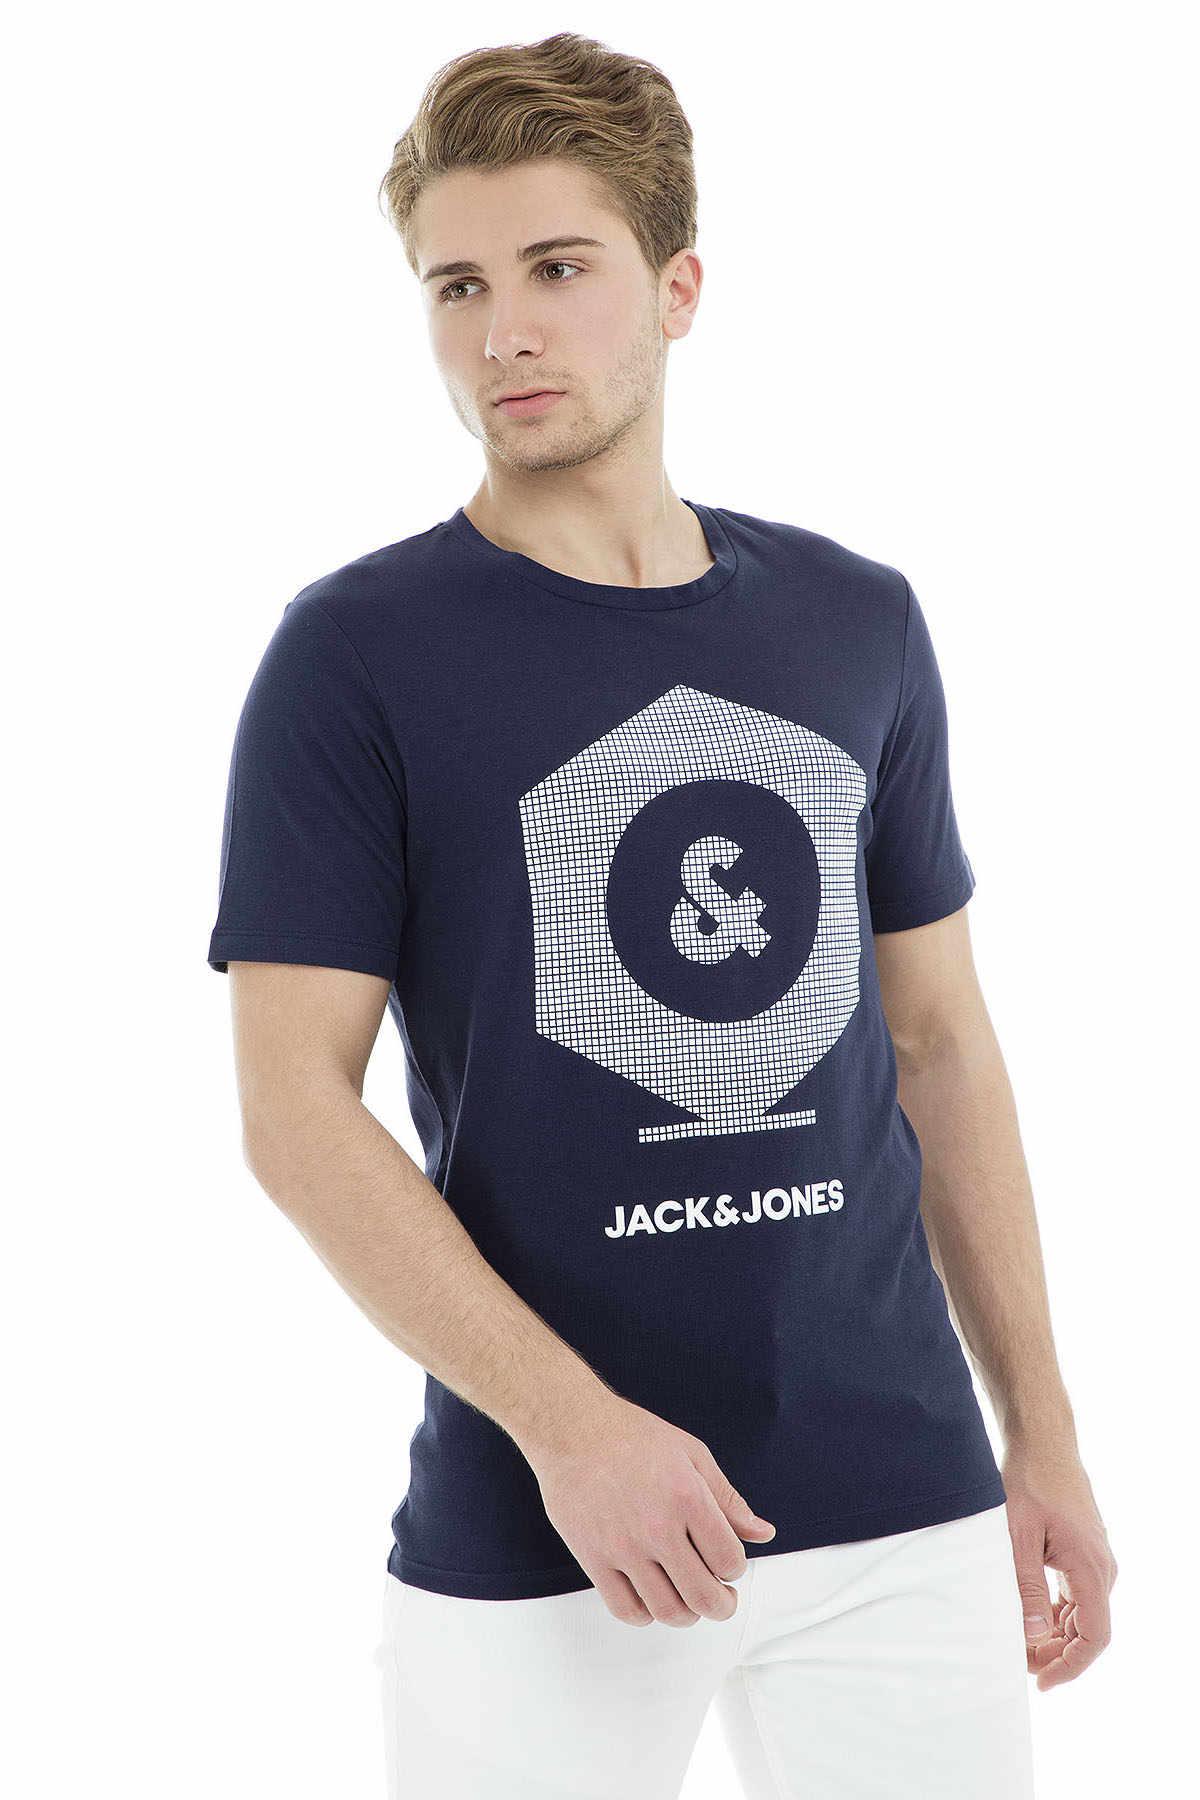 Jack /& Jones Boys Short Sleeve T Shirts Crew neck Summer Tee Tops for Kids